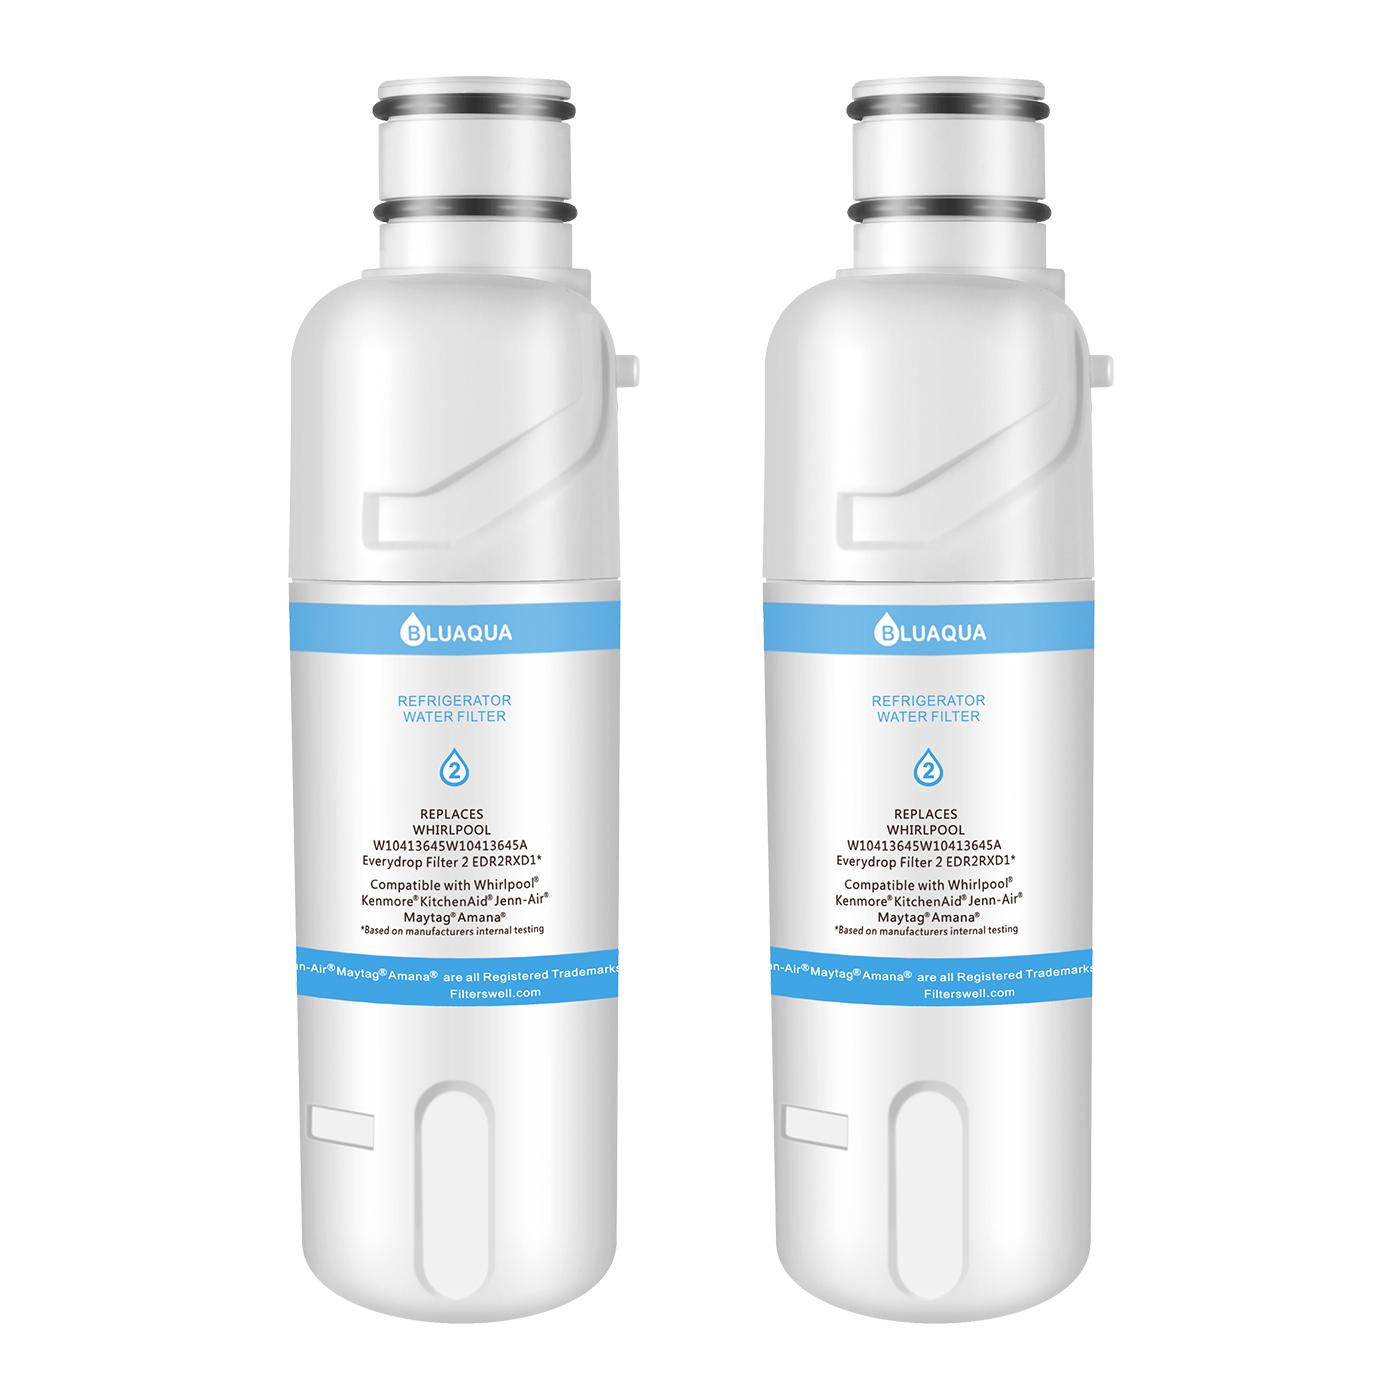 Kitchenaid Kfis29pbms00 Water Filter Edr2rxd1 2 Pack